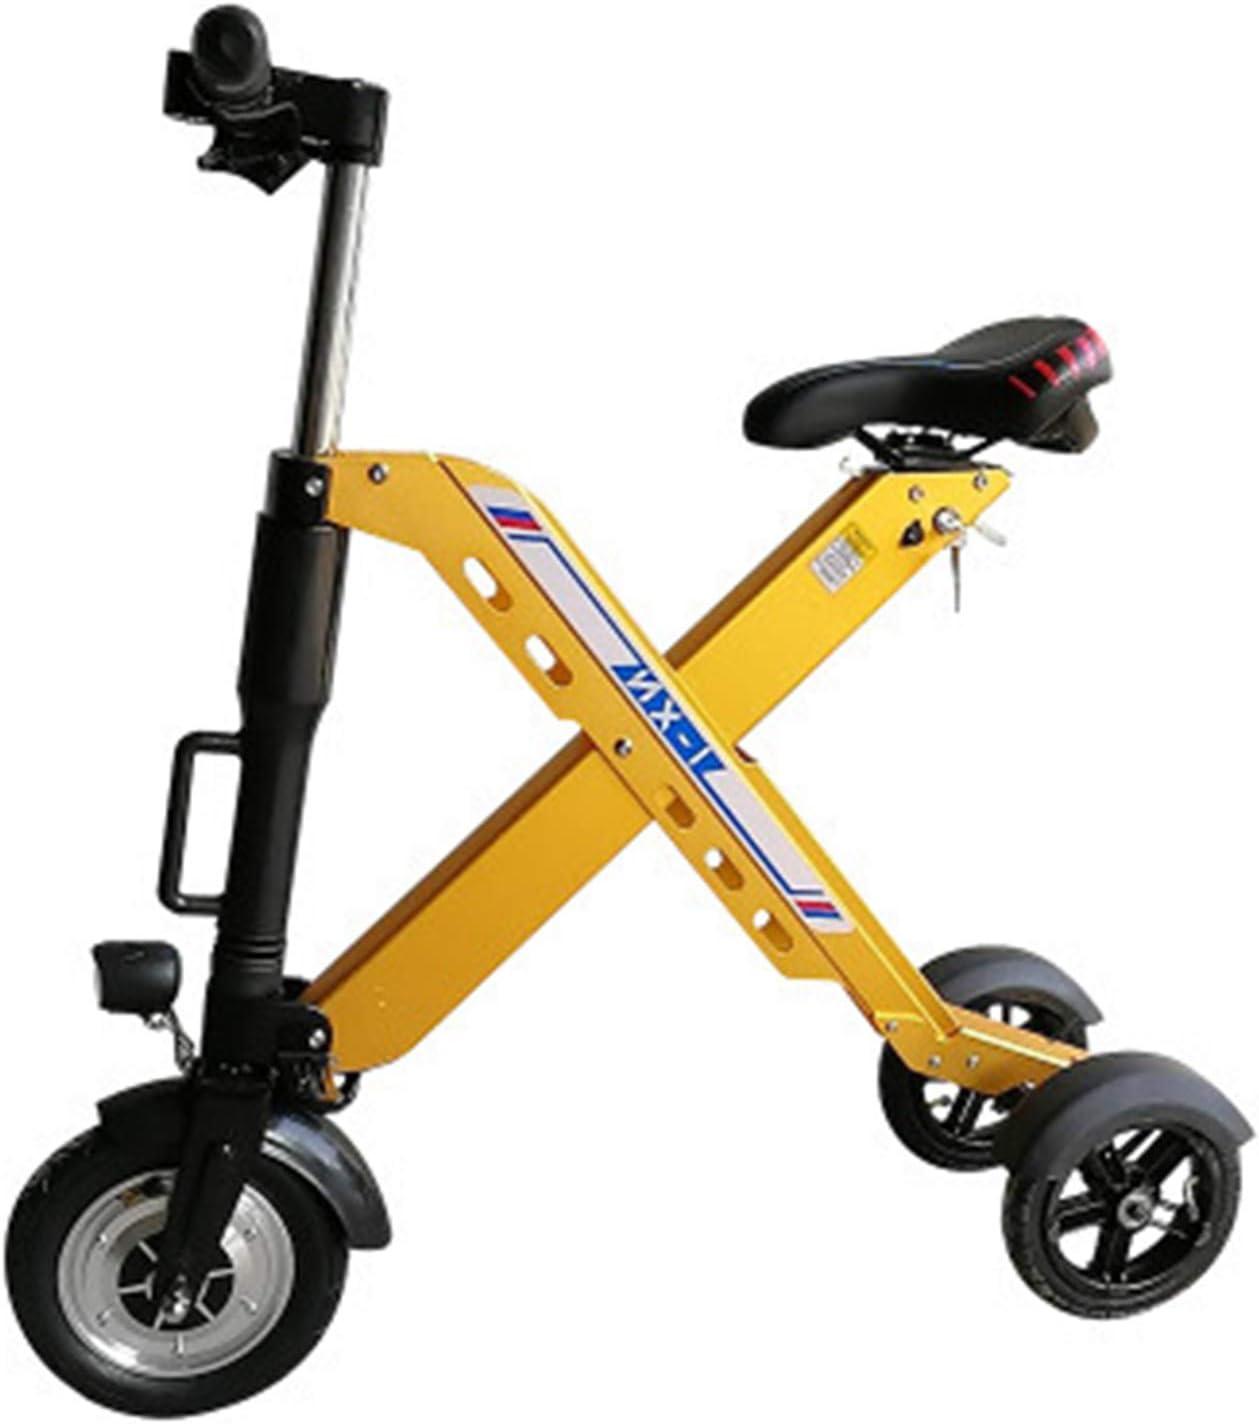 Zidao Plegable de Tres Ruedas e-Bike, Mini pequeña Bicicleta eléctrica para Hombres Mujeres Citypendeln ultraligeros Adultos Velocidad máxima 25 km por Hora,Amarillo